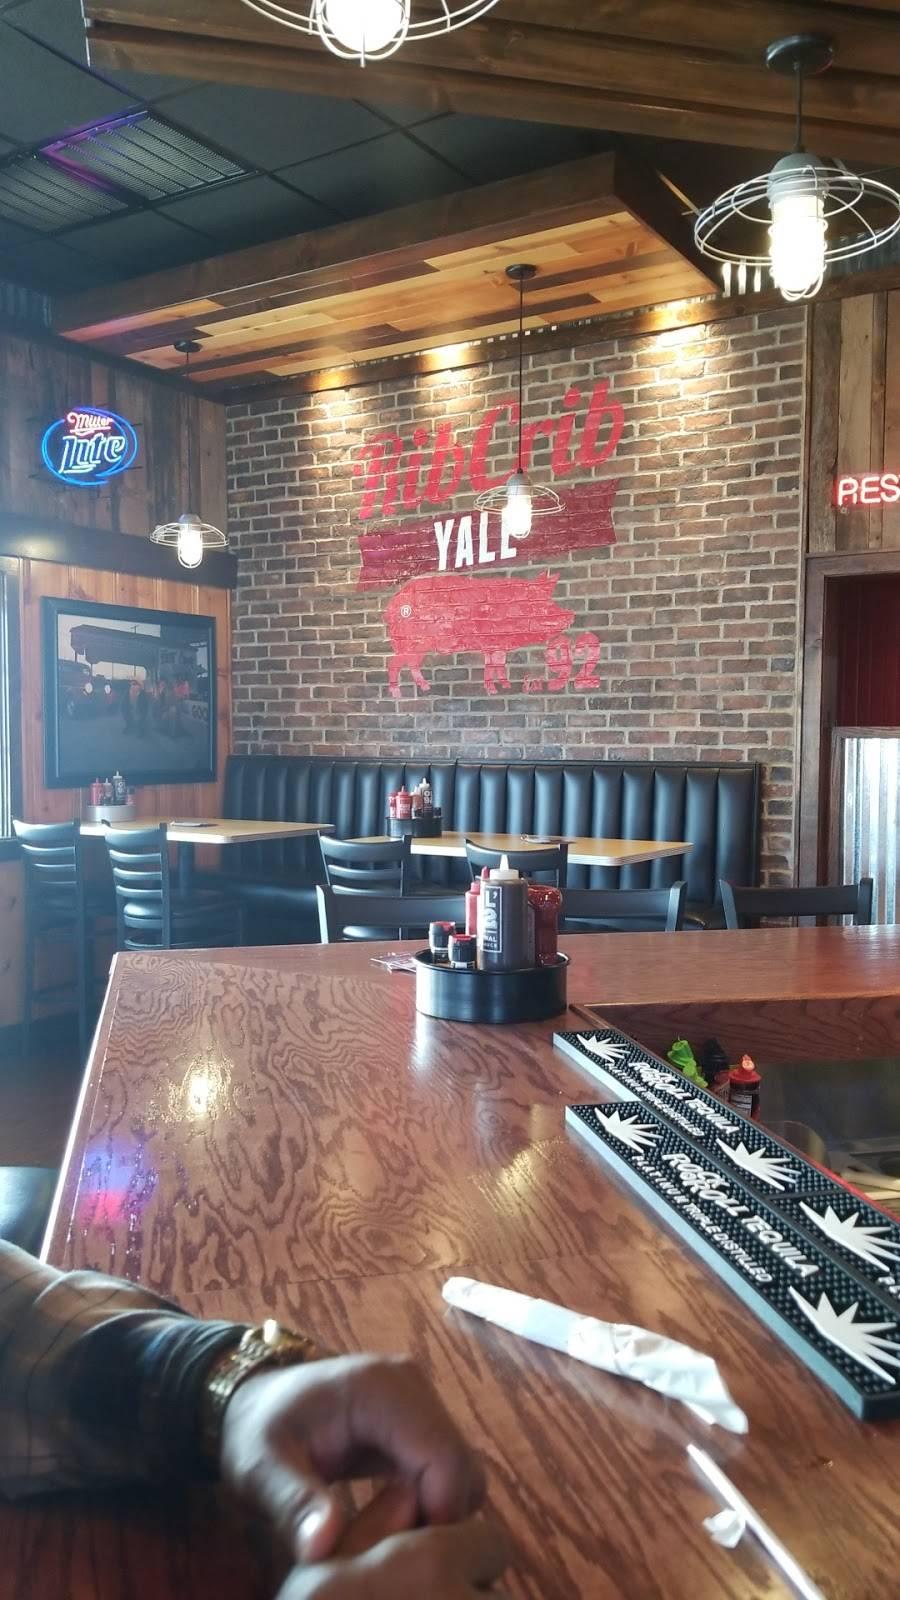 RibCrib BBQ & Grill - restaurant  | Photo 9 of 10 | Address: 8040 S Yale Ave, Tulsa, OK 74136, USA | Phone: (918) 492-8627